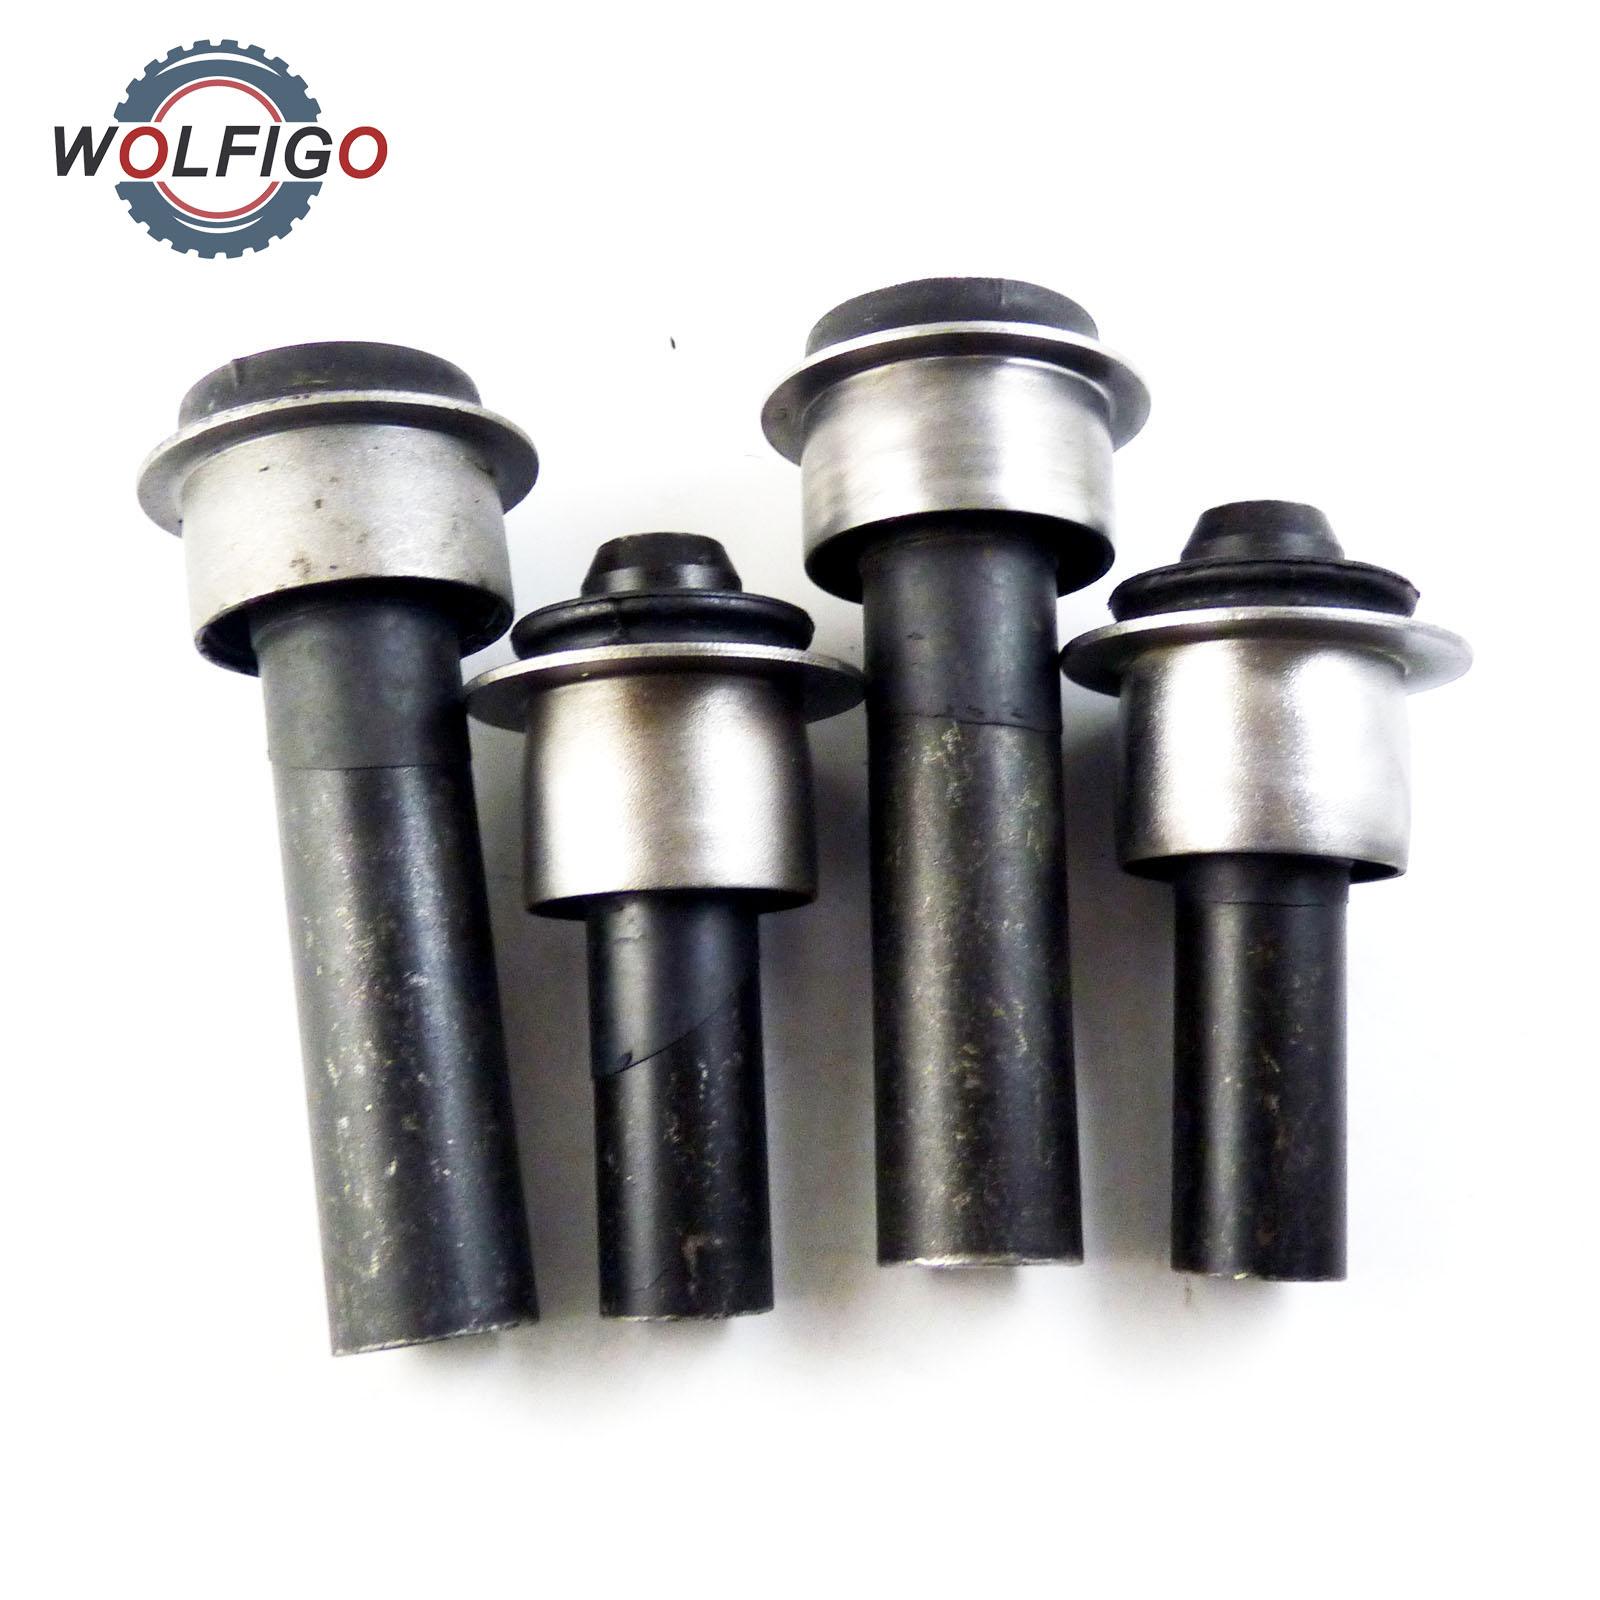 WOLFIGO 4pcs Set Engine Cradle Subframe Crossmember Bushing 54467BR00A 54466 JD000 for Nissan Rogue X Trail